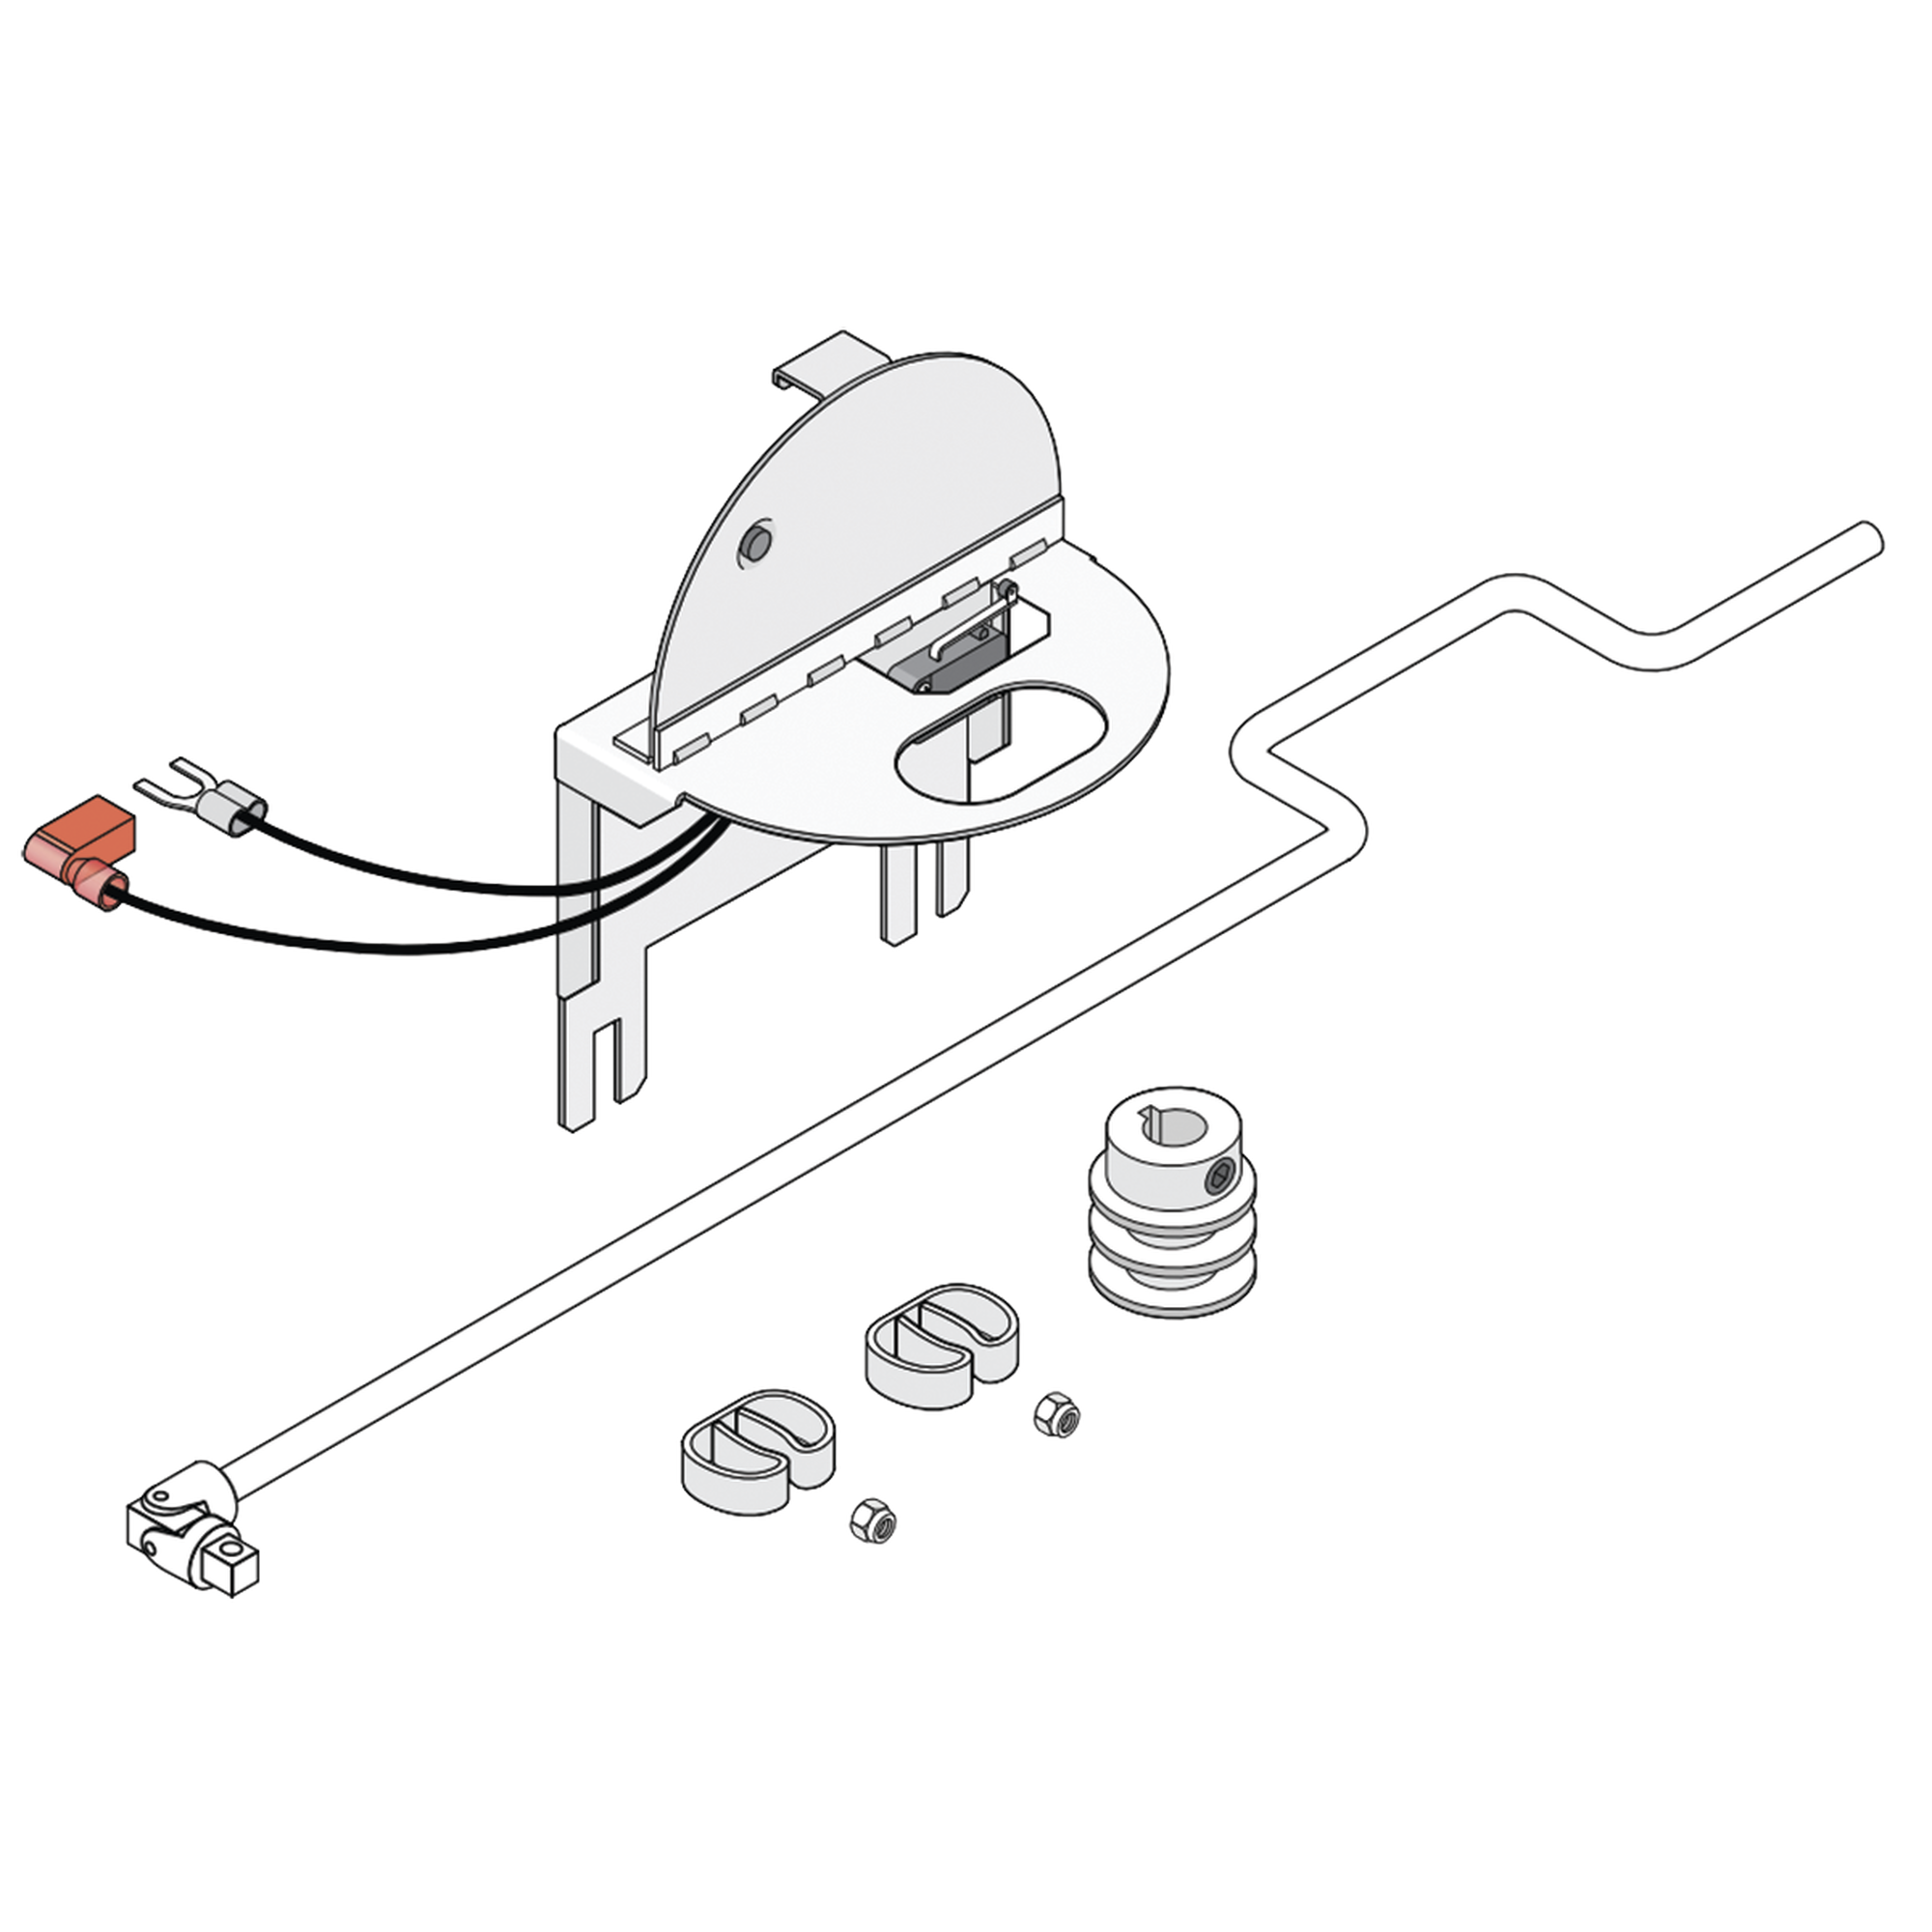 Kit de operación manual para barrera 1601